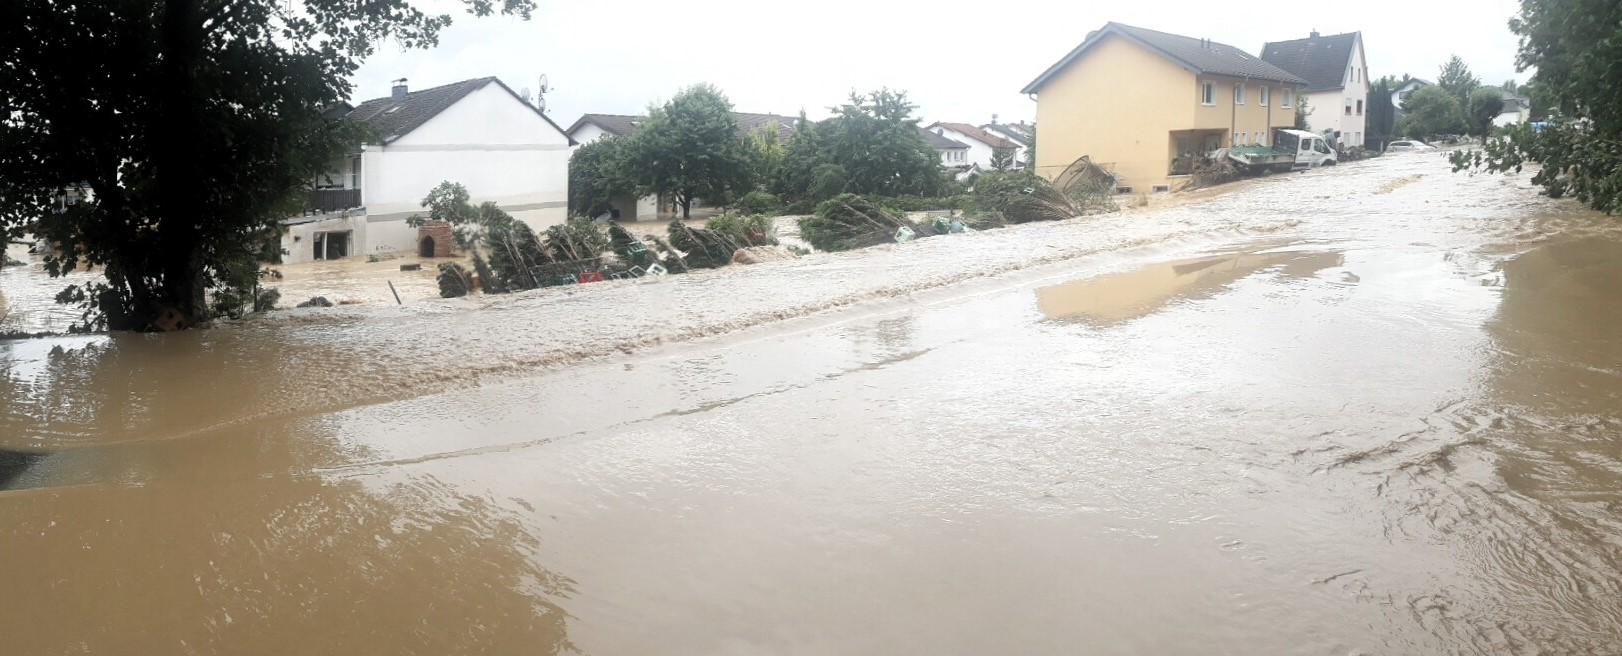 Flutkatastrophe Ahrtal Straße überflutet